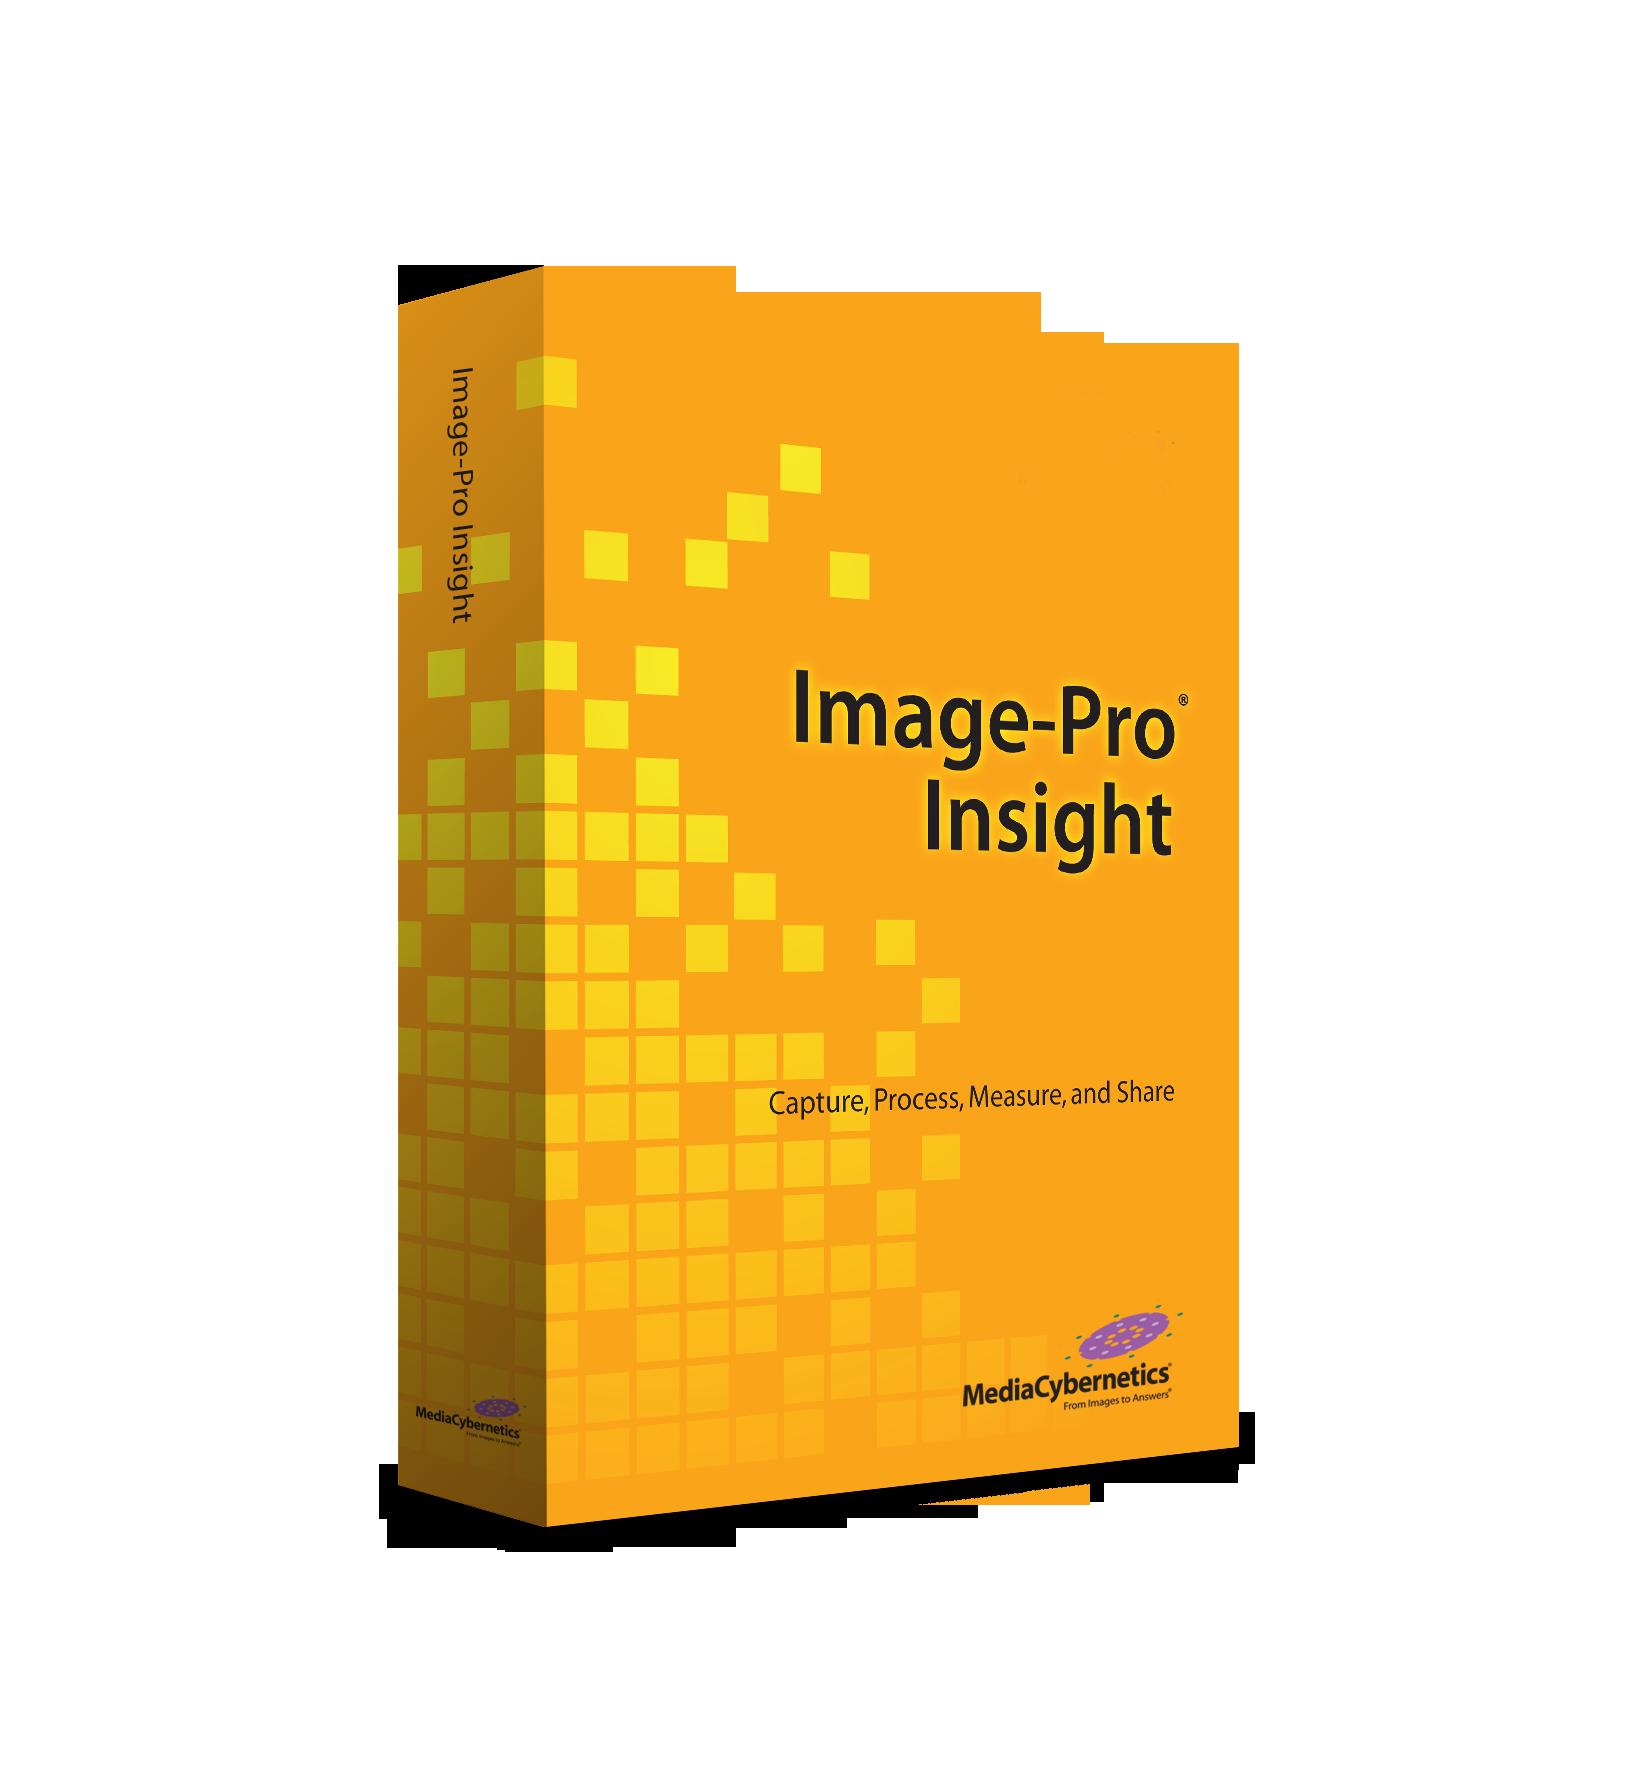 Image-Pro Insight Image Analysis Software